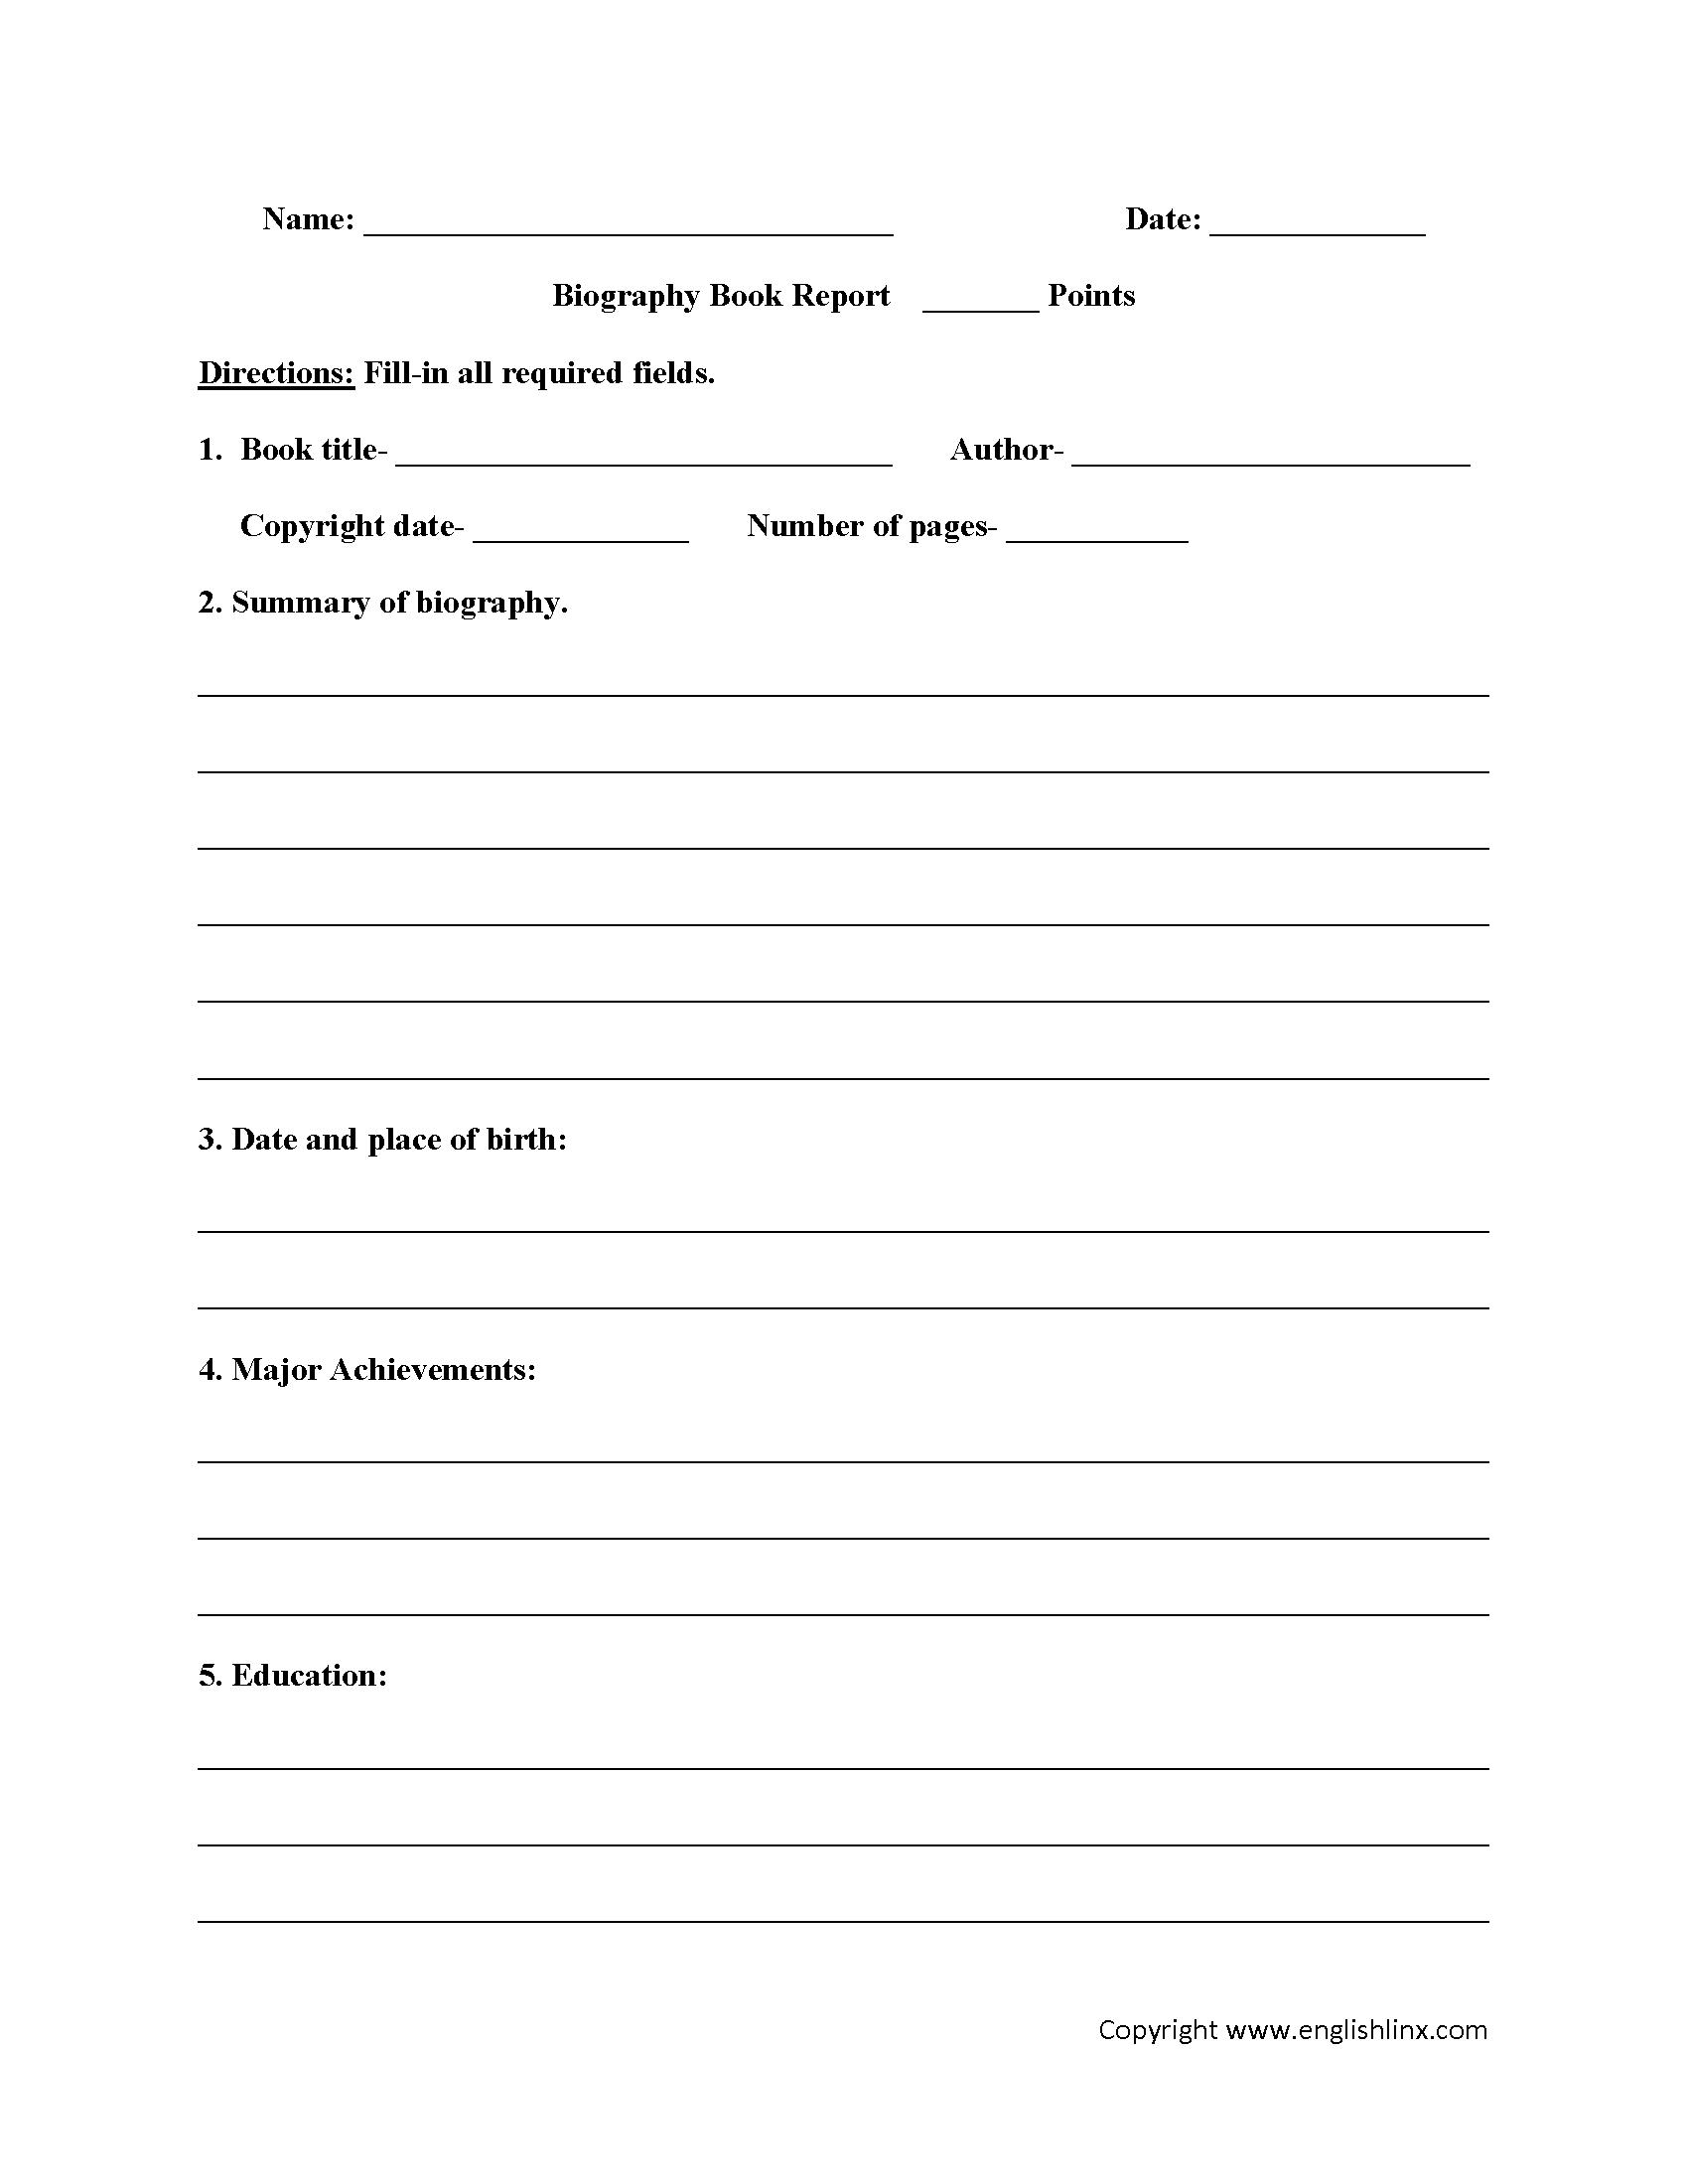 Englishlinx | Book Report Worksheets | Book Report Printable Worksheets